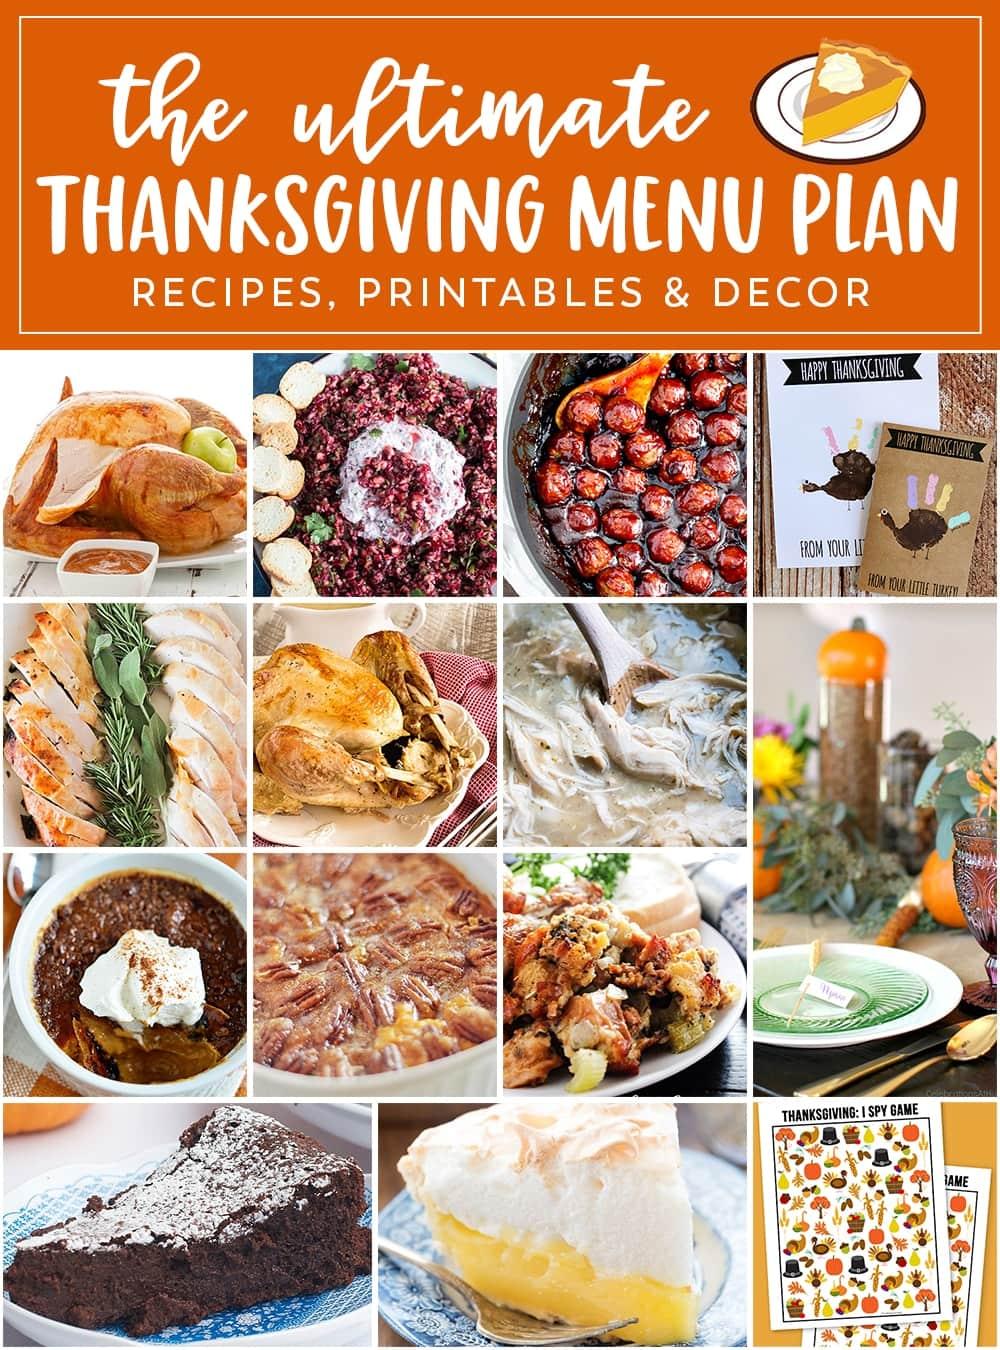 photograph regarding Thanksgiving Menu Planner Printable referred to as Thanksgiving Menu Planner - Julies Eats Snacks ®